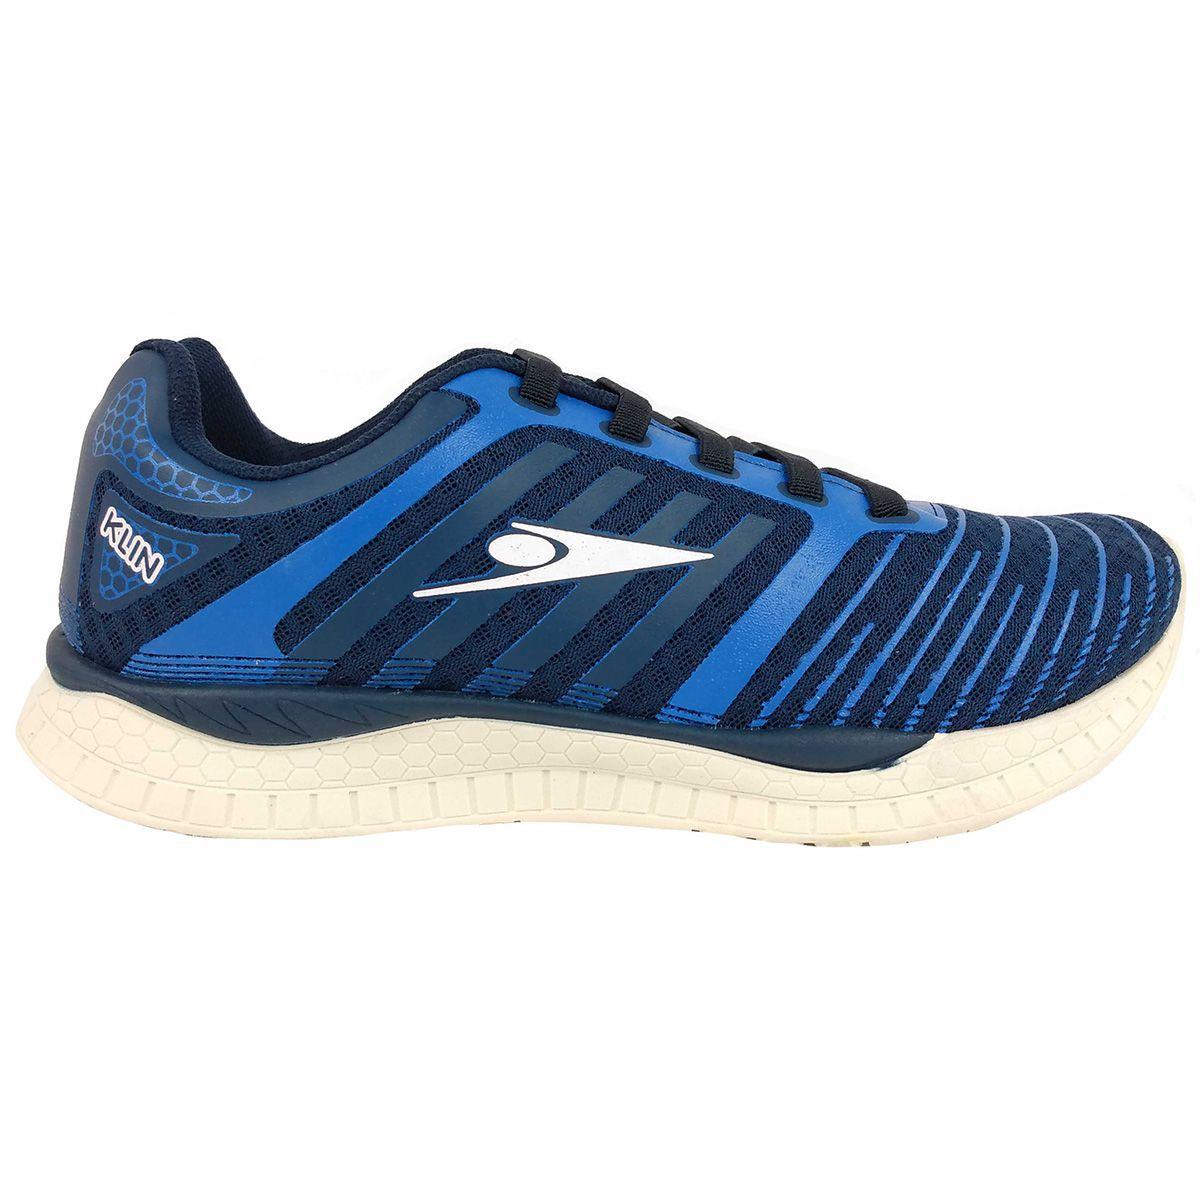 Tenis Klin Masculino Step Flex Azul